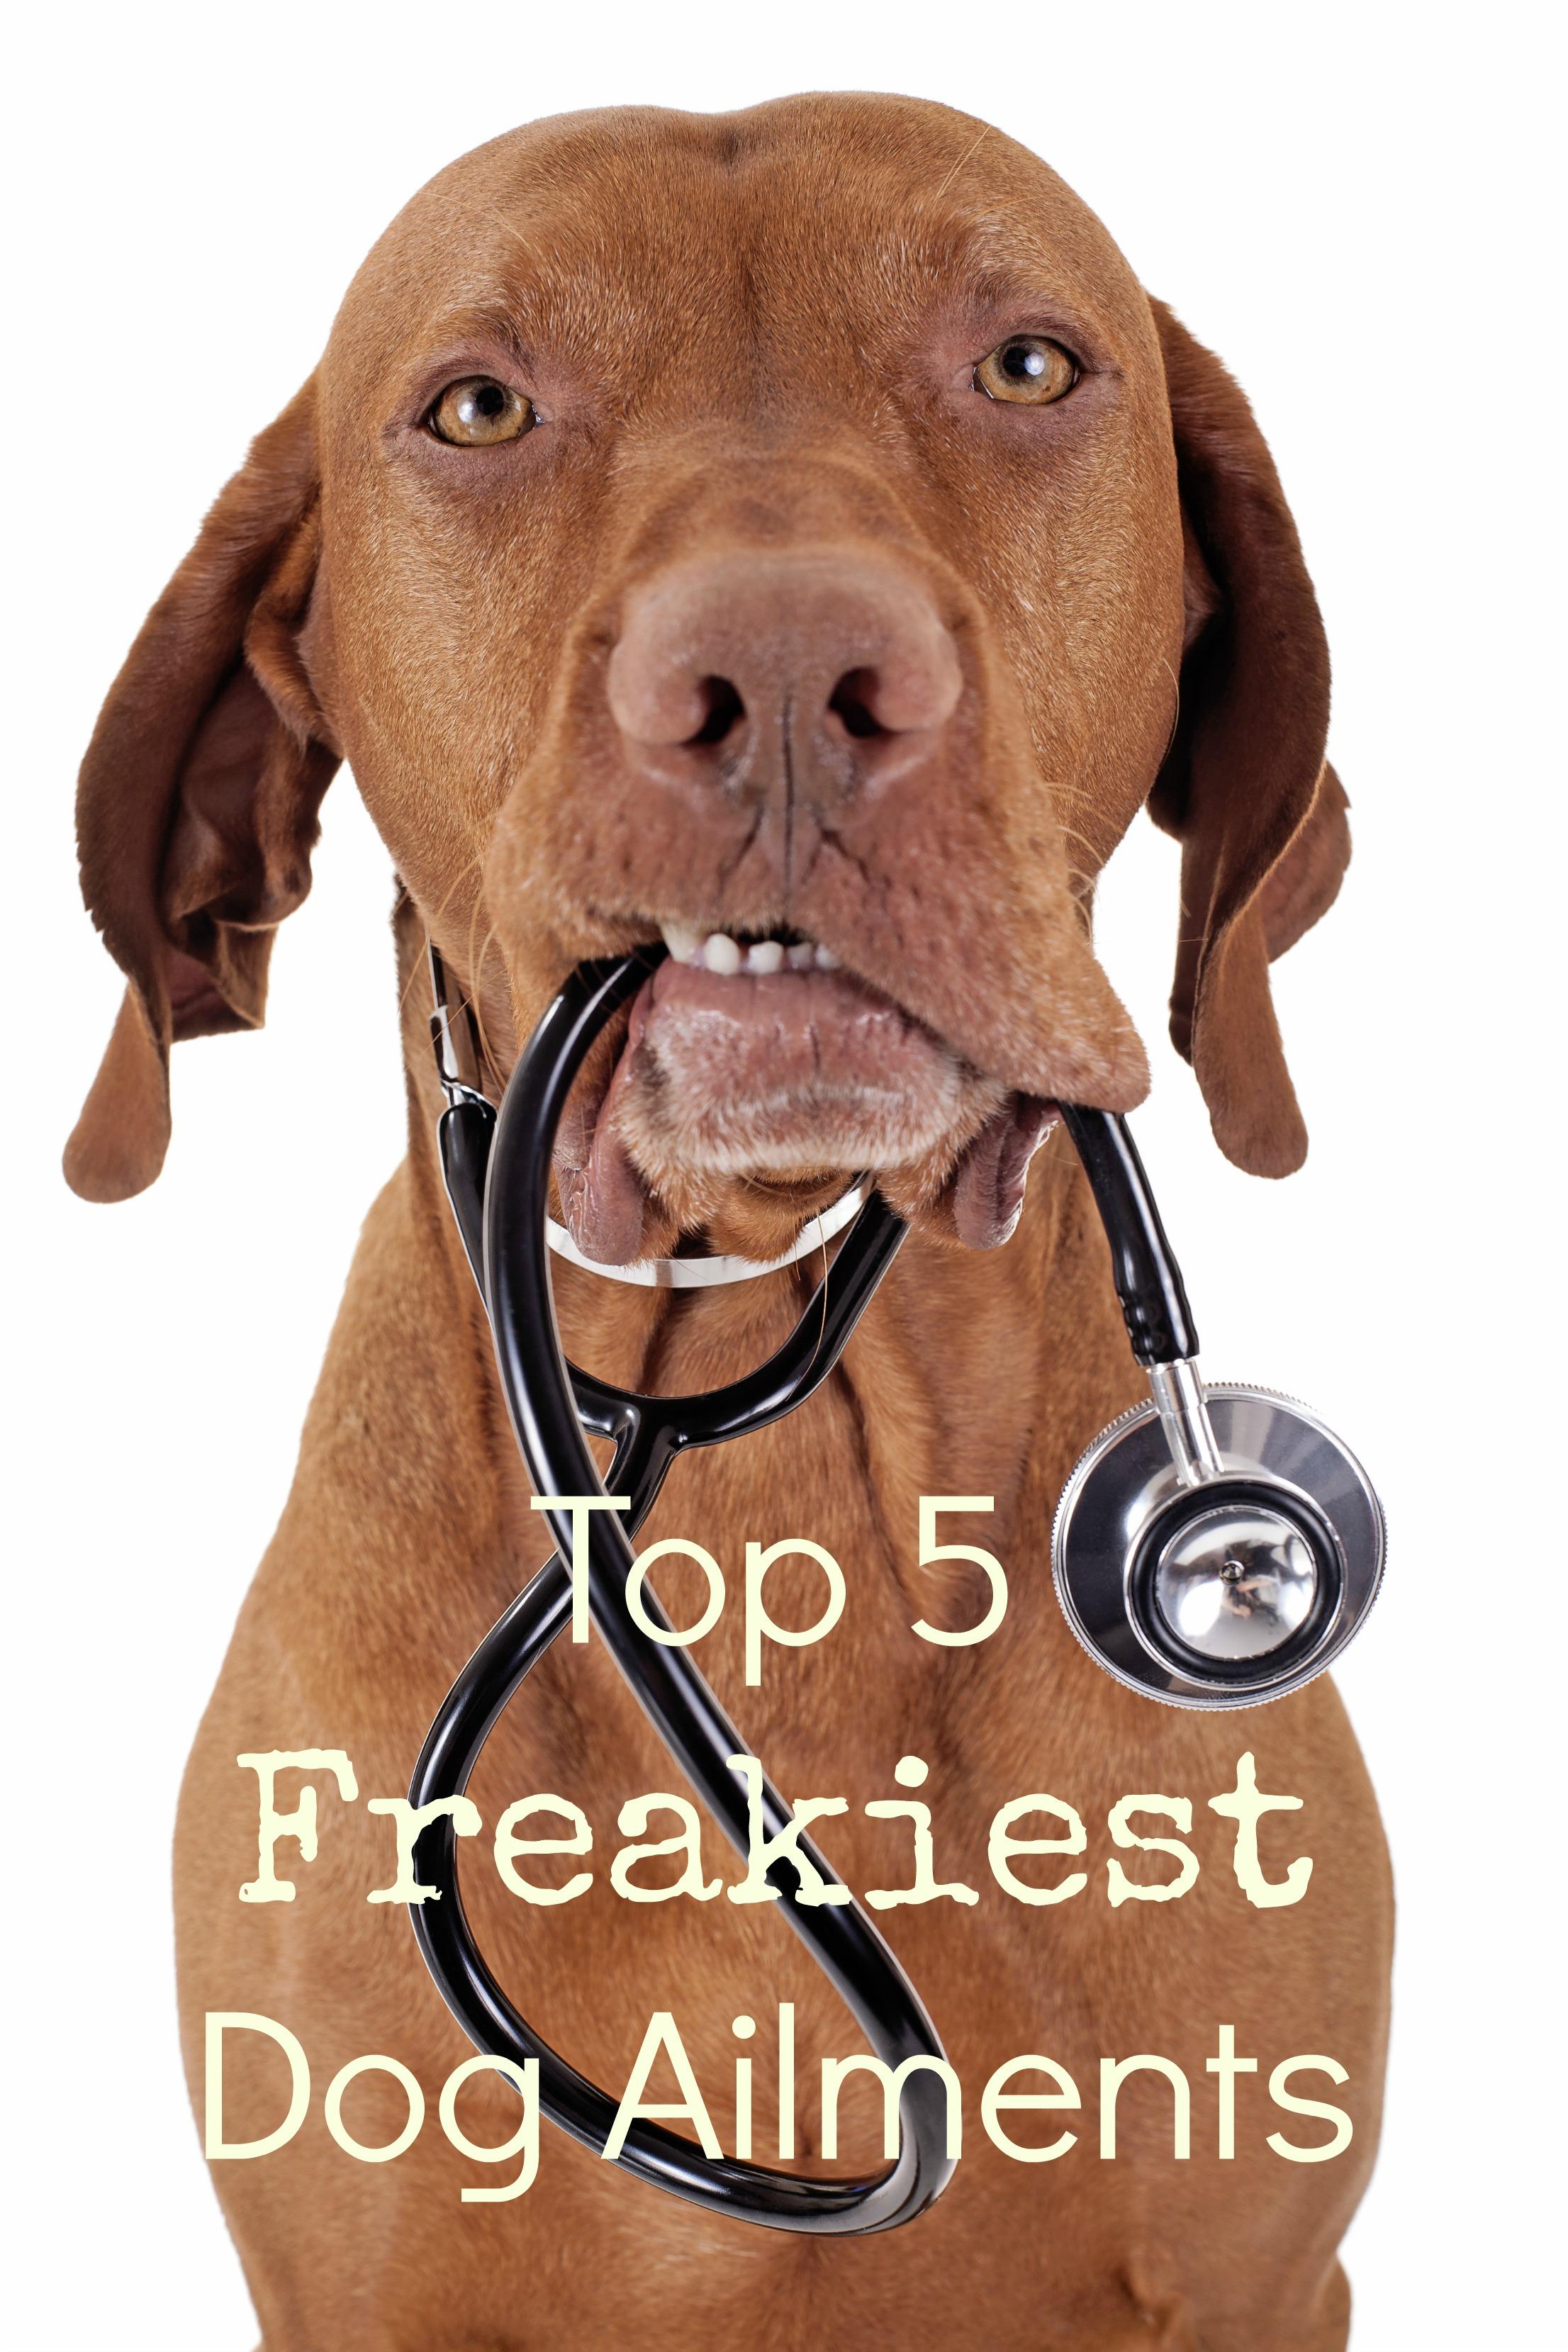 Top 5 Freakiest Dog Ailments Dog Vills